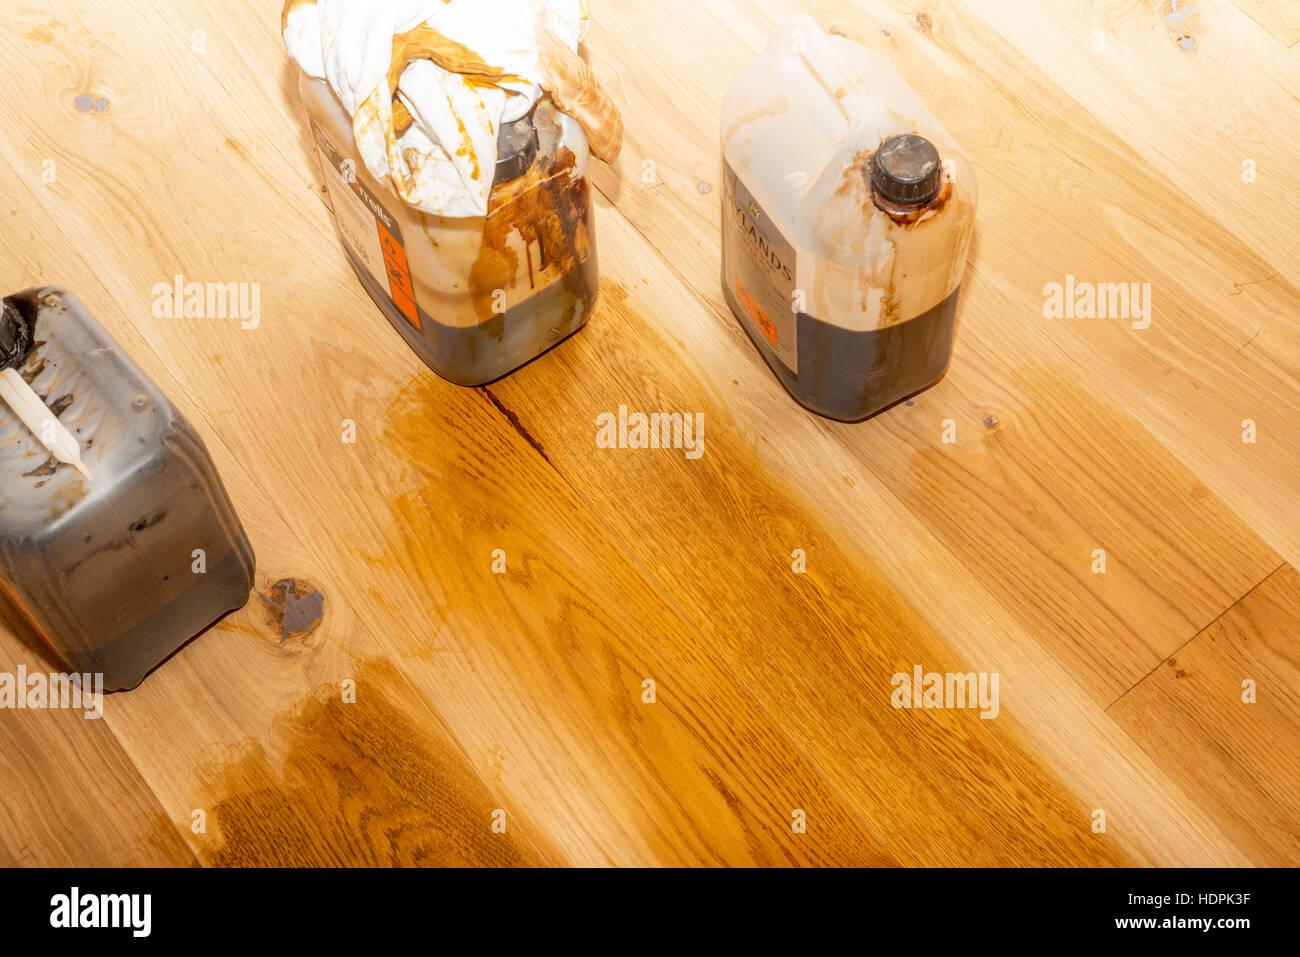 Wood Floor Stock Photos Wood Floor Stock Images Alamy